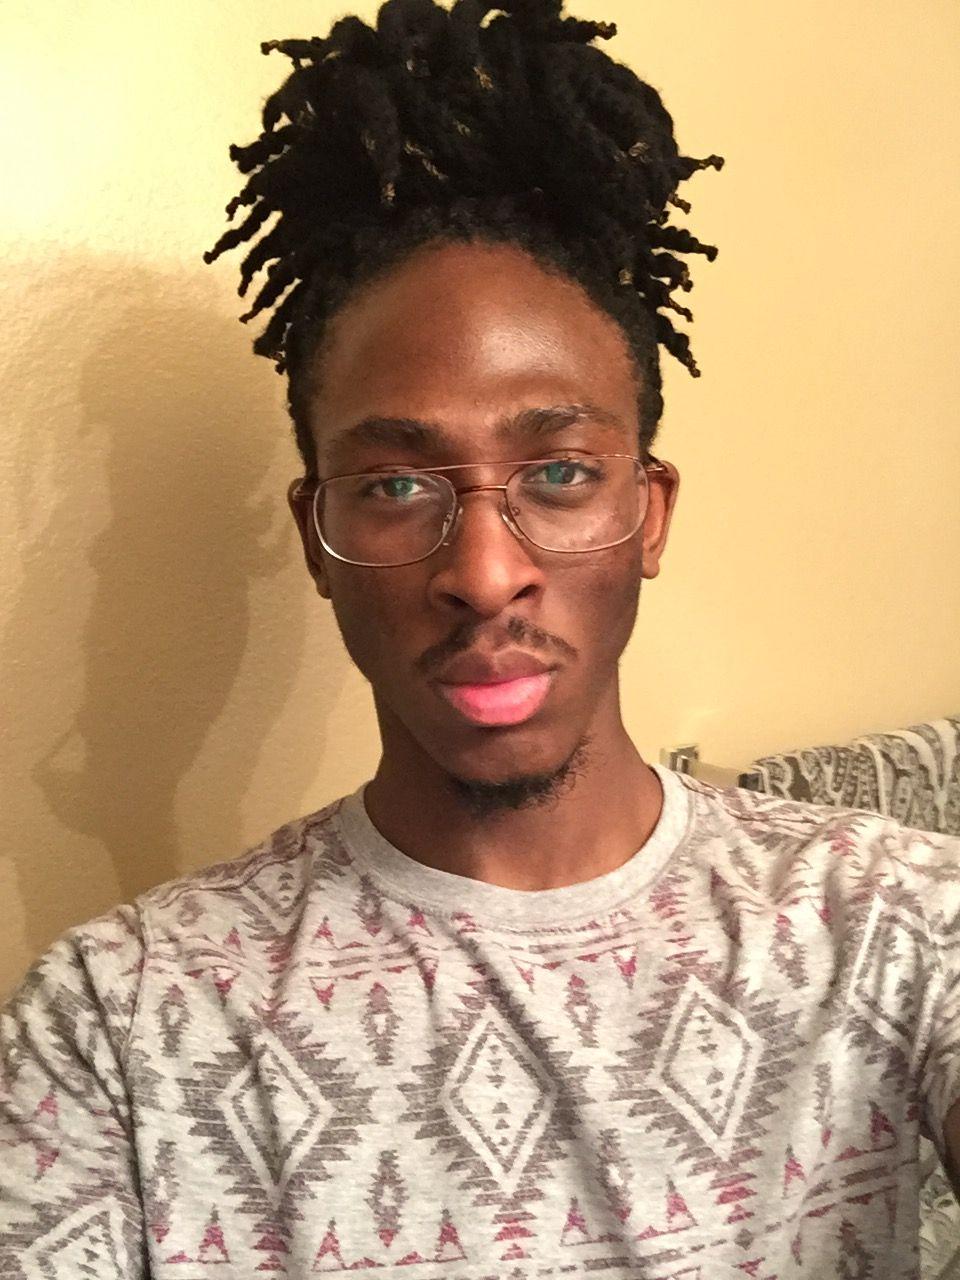 Pin By Joshua Harris On Black Men Hairstyles Pinterest Black Men